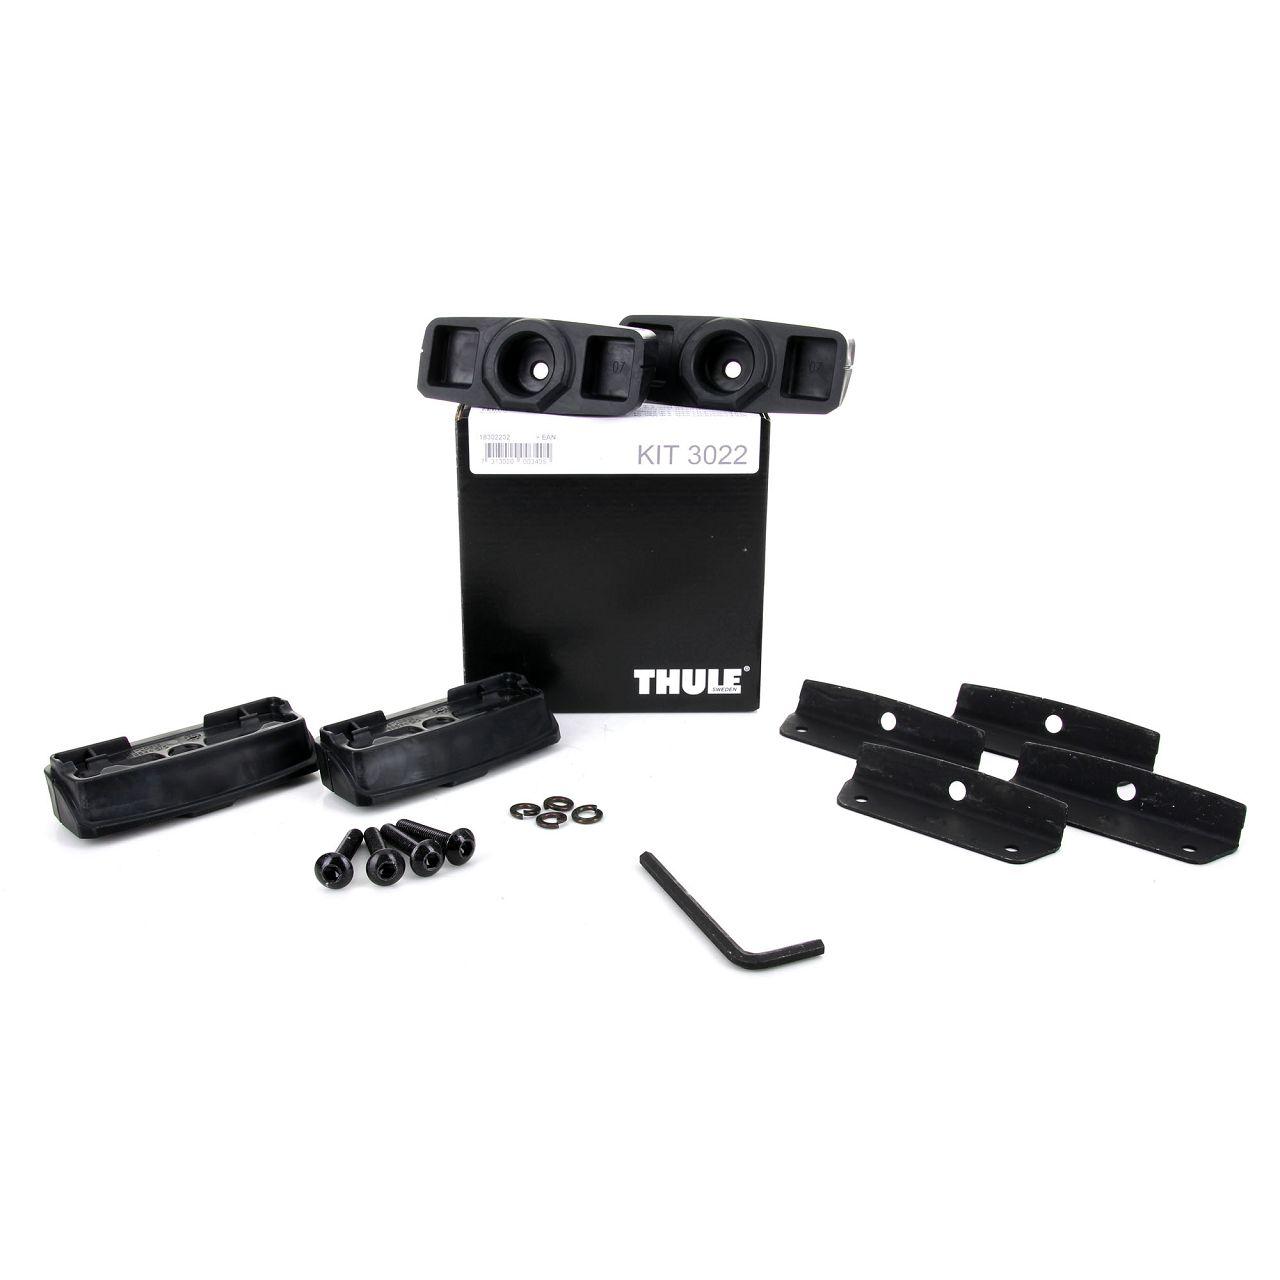 THULE Kit 3022 Montagesatz Montagekit Dachträger FixPoint XT